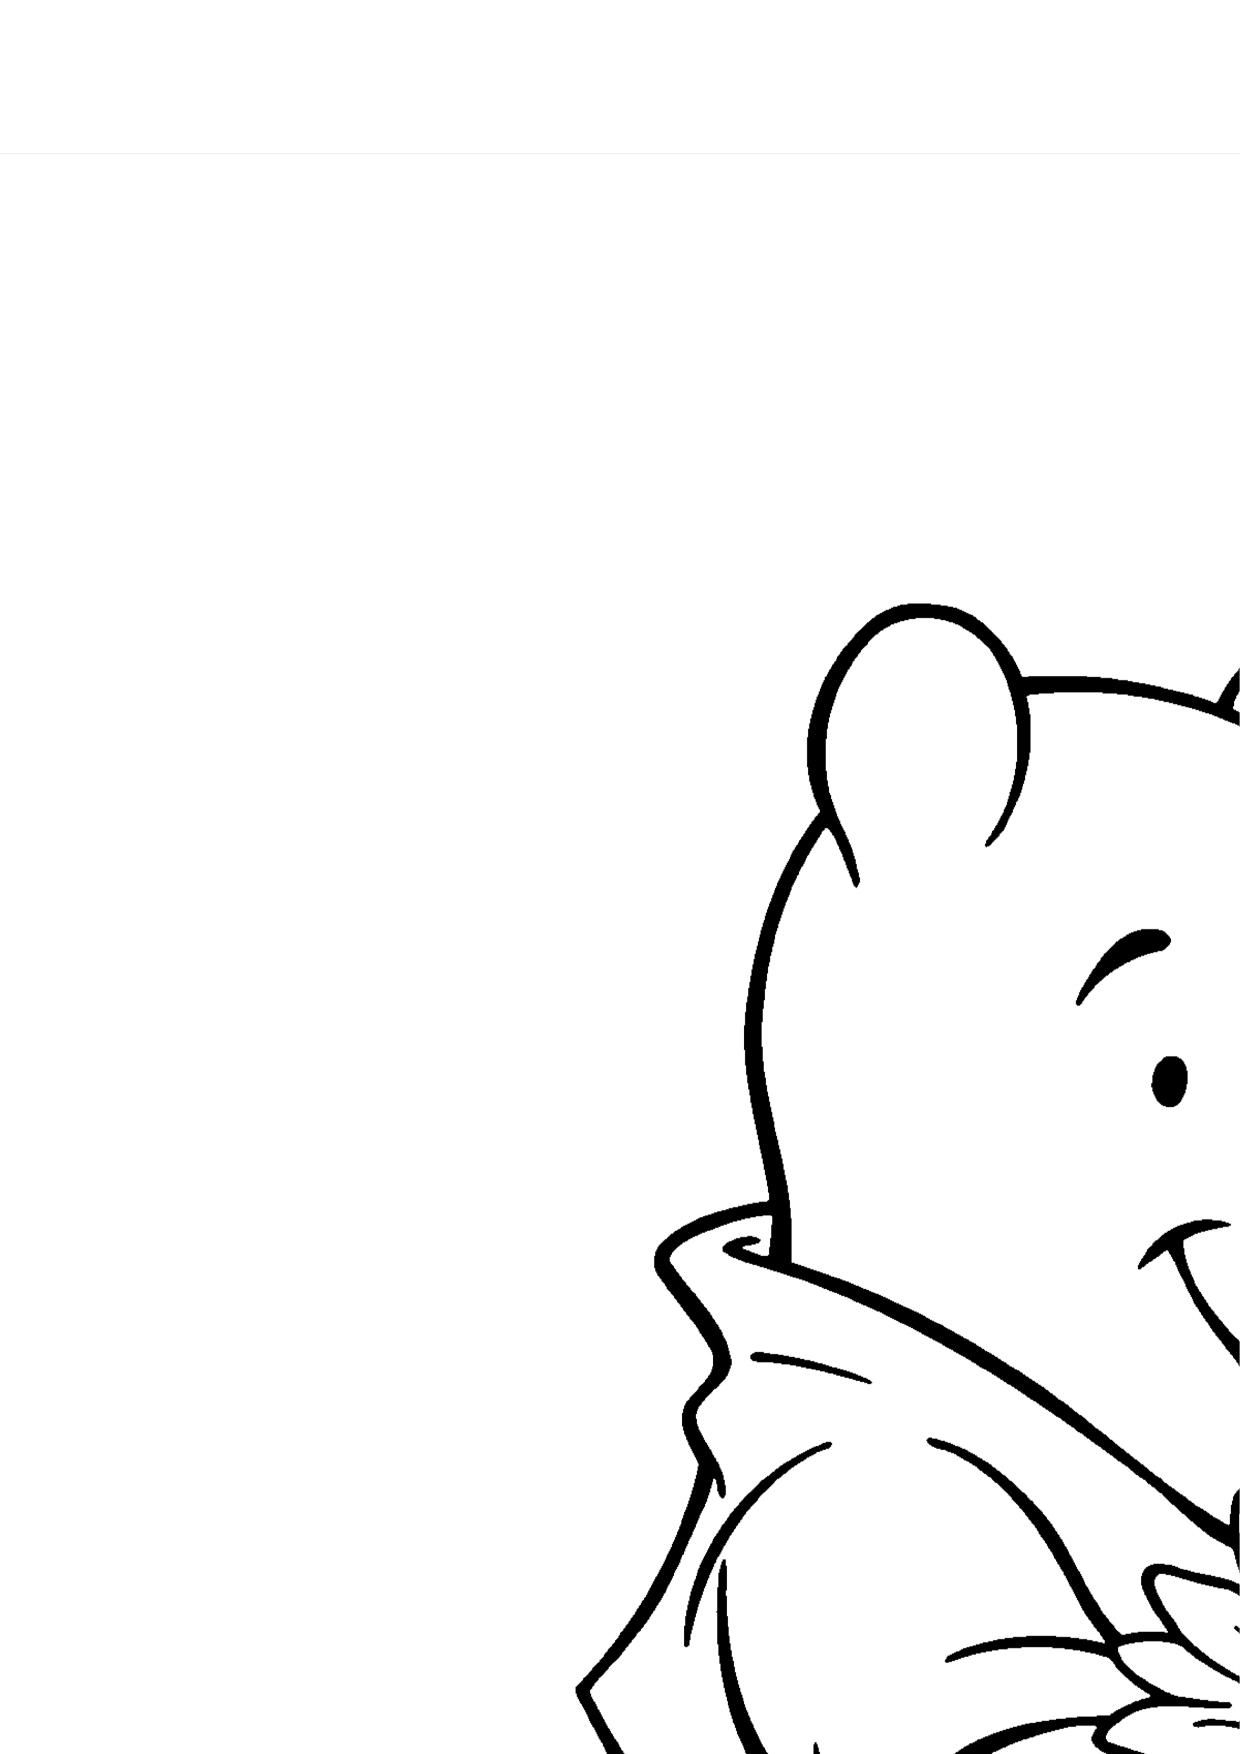 Kolorowanki Xxl Kubus Puchatek Dzien Kubusia Puchatka Kolorowanki Xxl Square Glass Snoopy